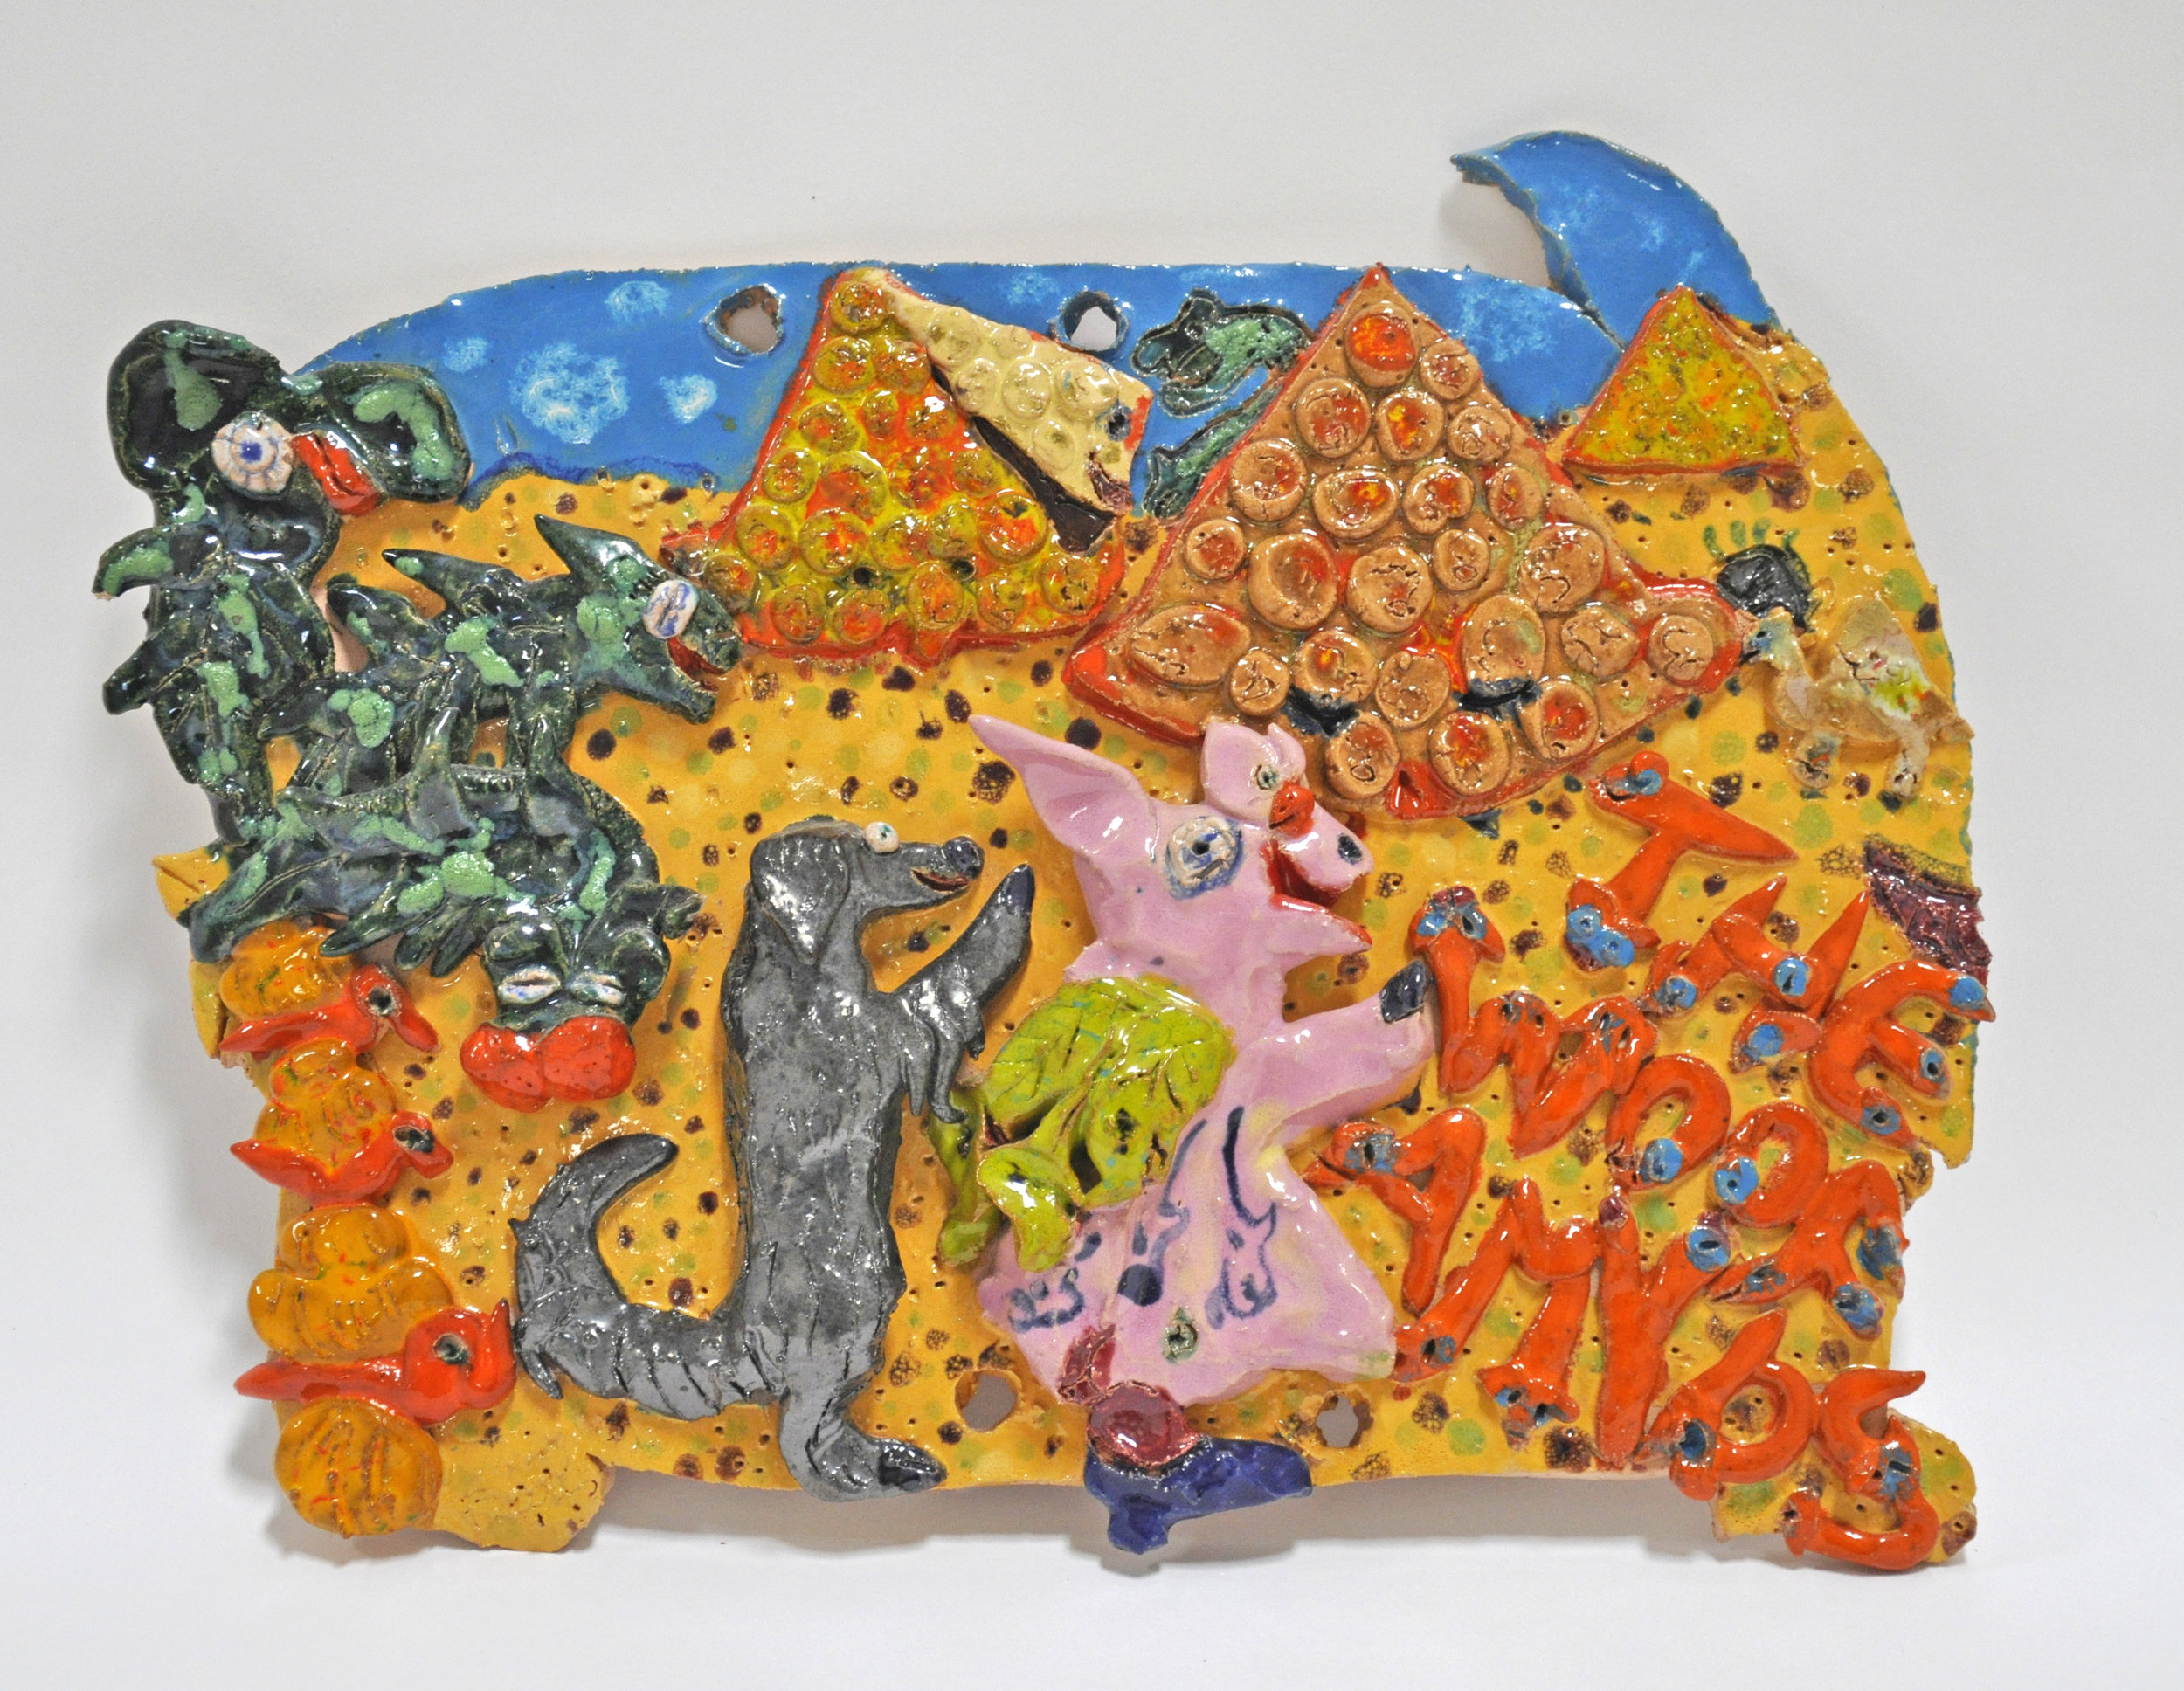 "Maija Peeples-Bright, ""Woof and Rhearino visit the Woofamyds"", glazed ceramic, 12 x 1.5 x 15.5 in, 1977"